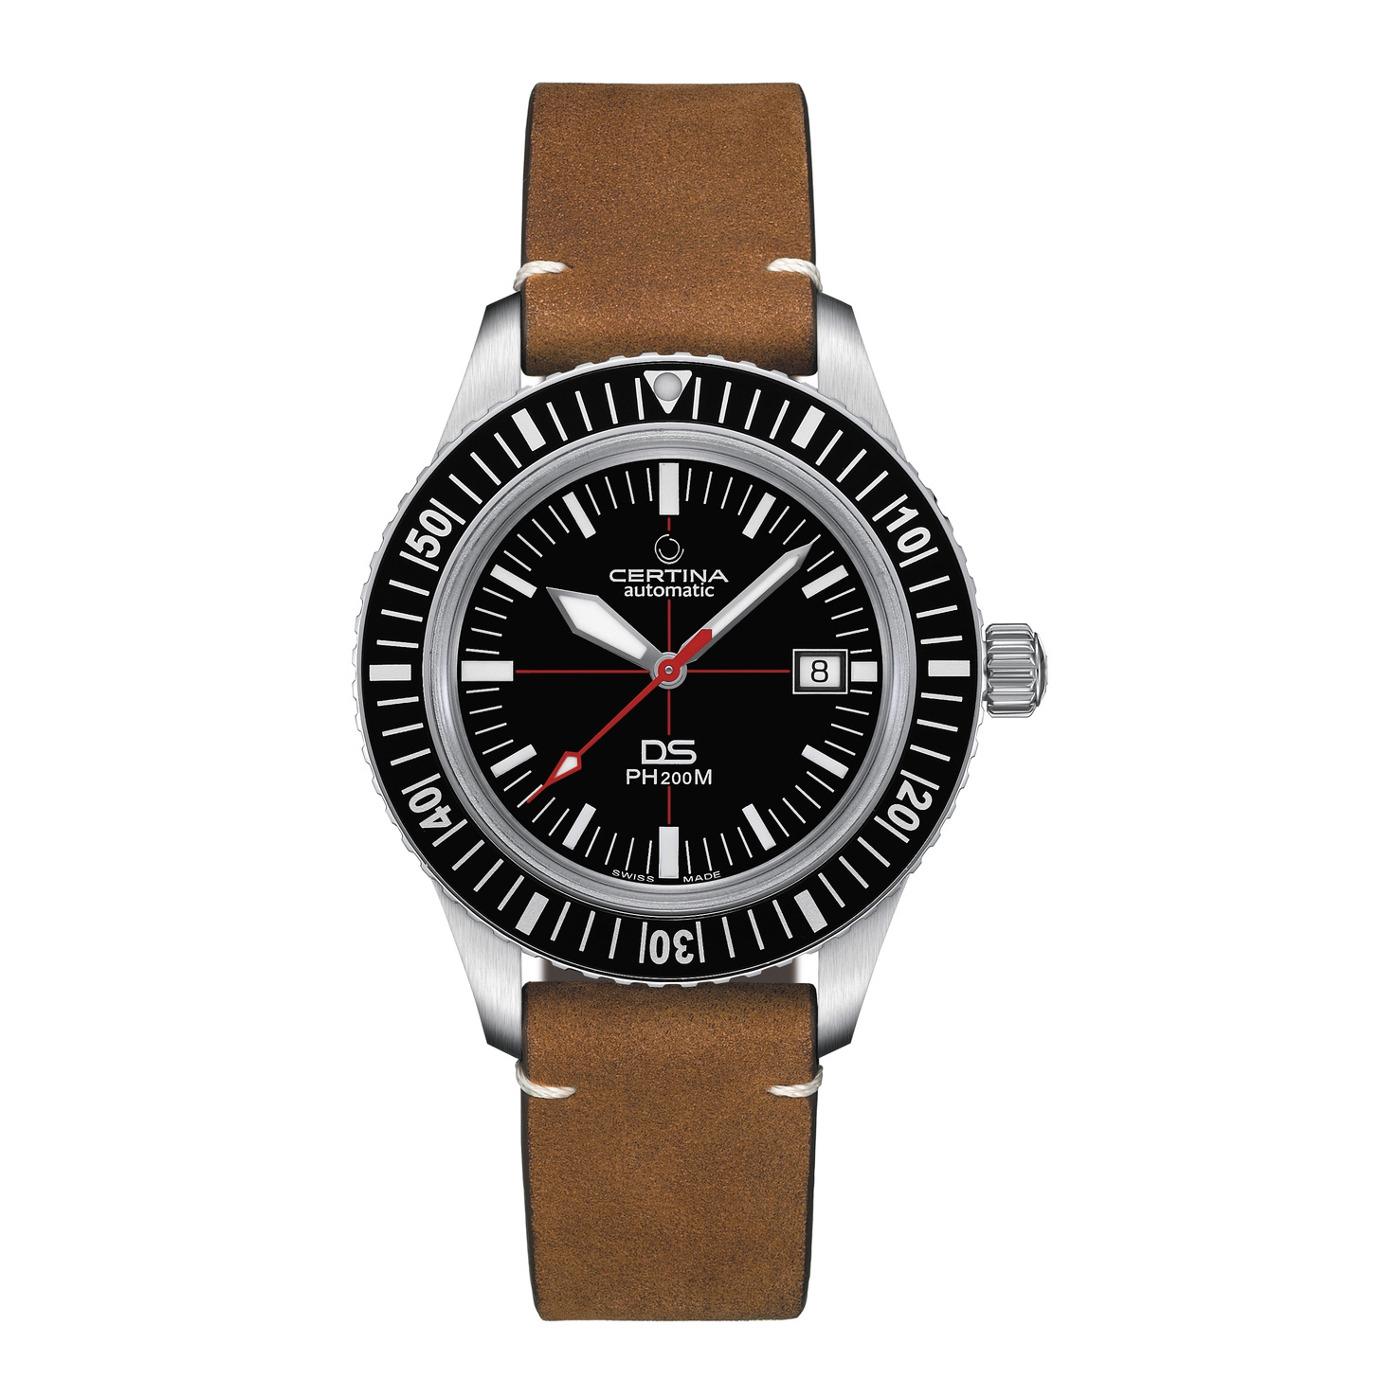 Afbeelding van Certina Aqua horloge C036.407.16.050.00